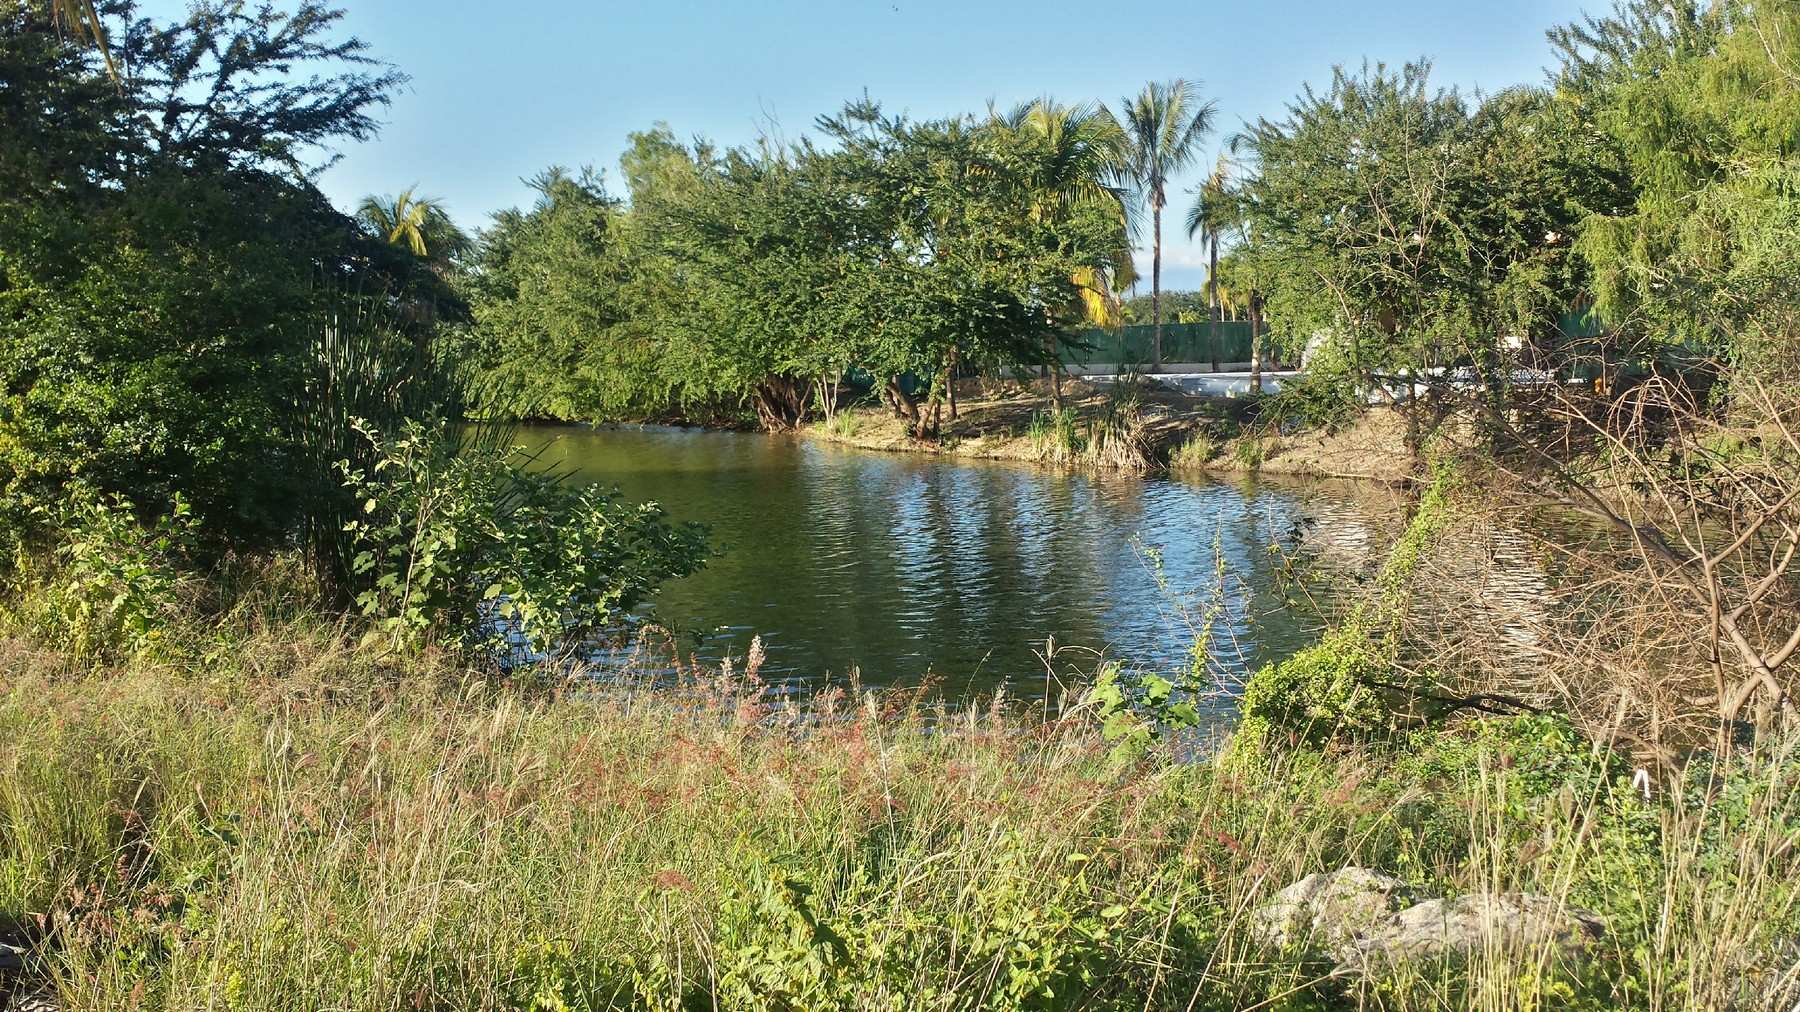 Additional photo for property listing at Residential Lot, 18 Isla Guacamayas, El Tigre Golf Course, Nuevo Vallarta Lote 18 Isla Guacamaya El Tigre Nuevo Vallarta, Nayarit 63735 Mexico